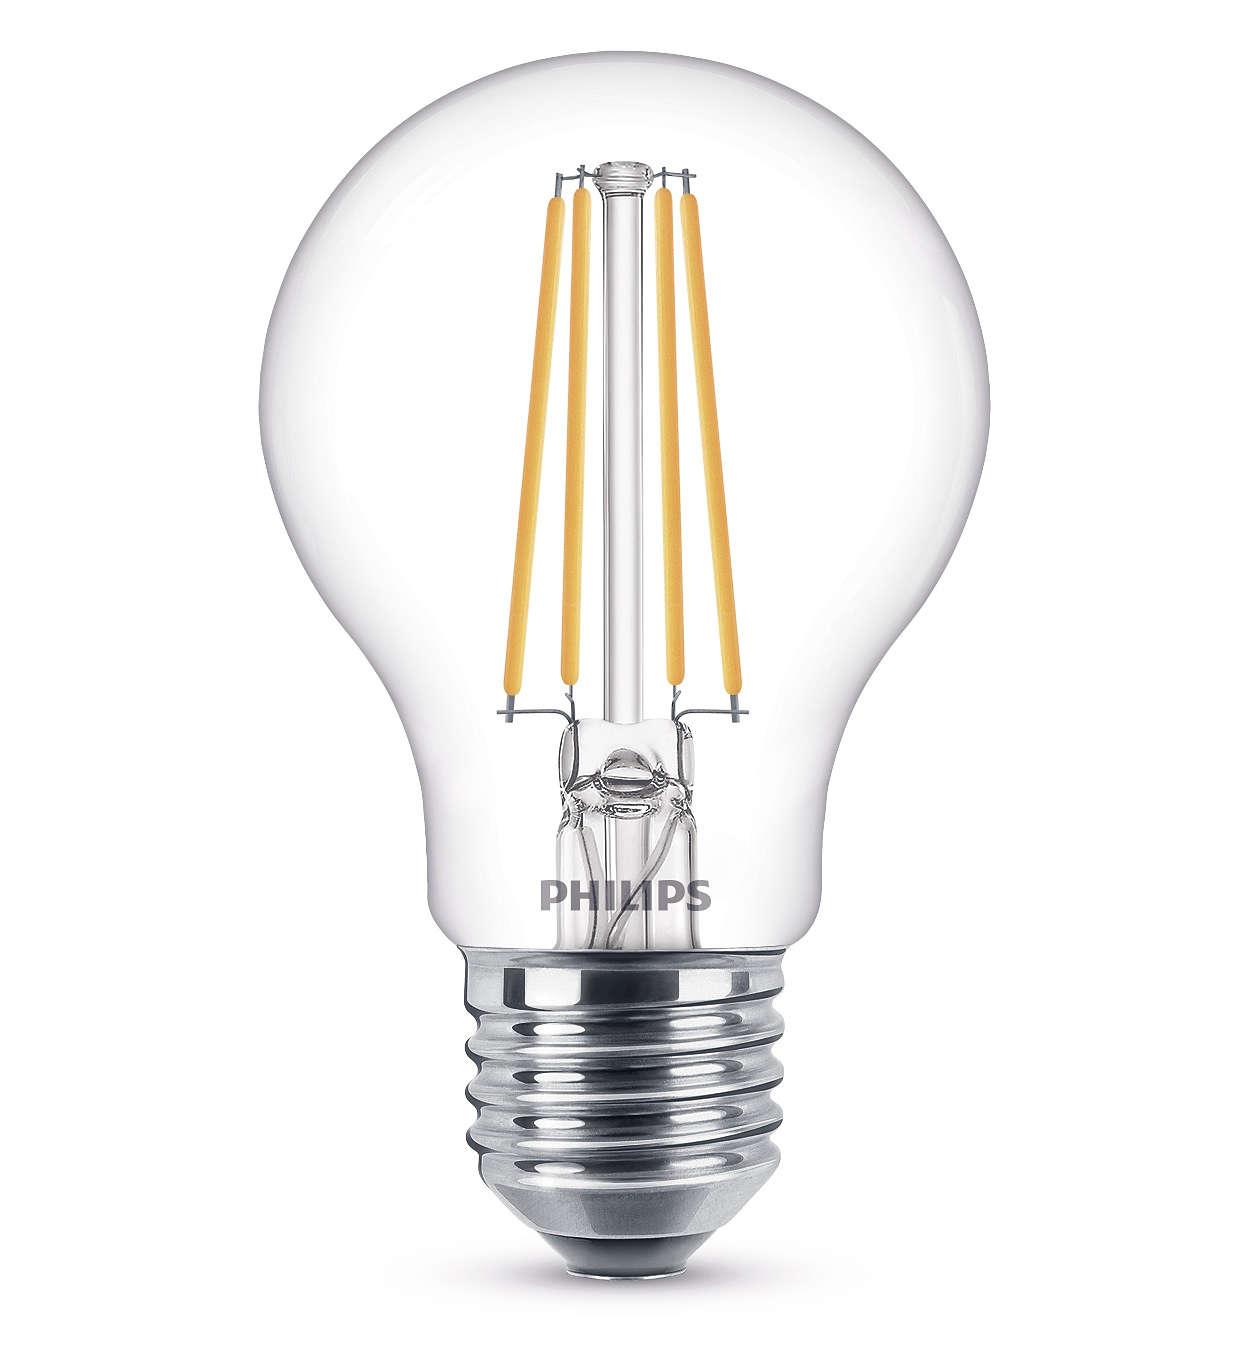 Philips 8718696742419 E27 LED Classic Leuchtmittel 7W 60mm Warmweiß Klar